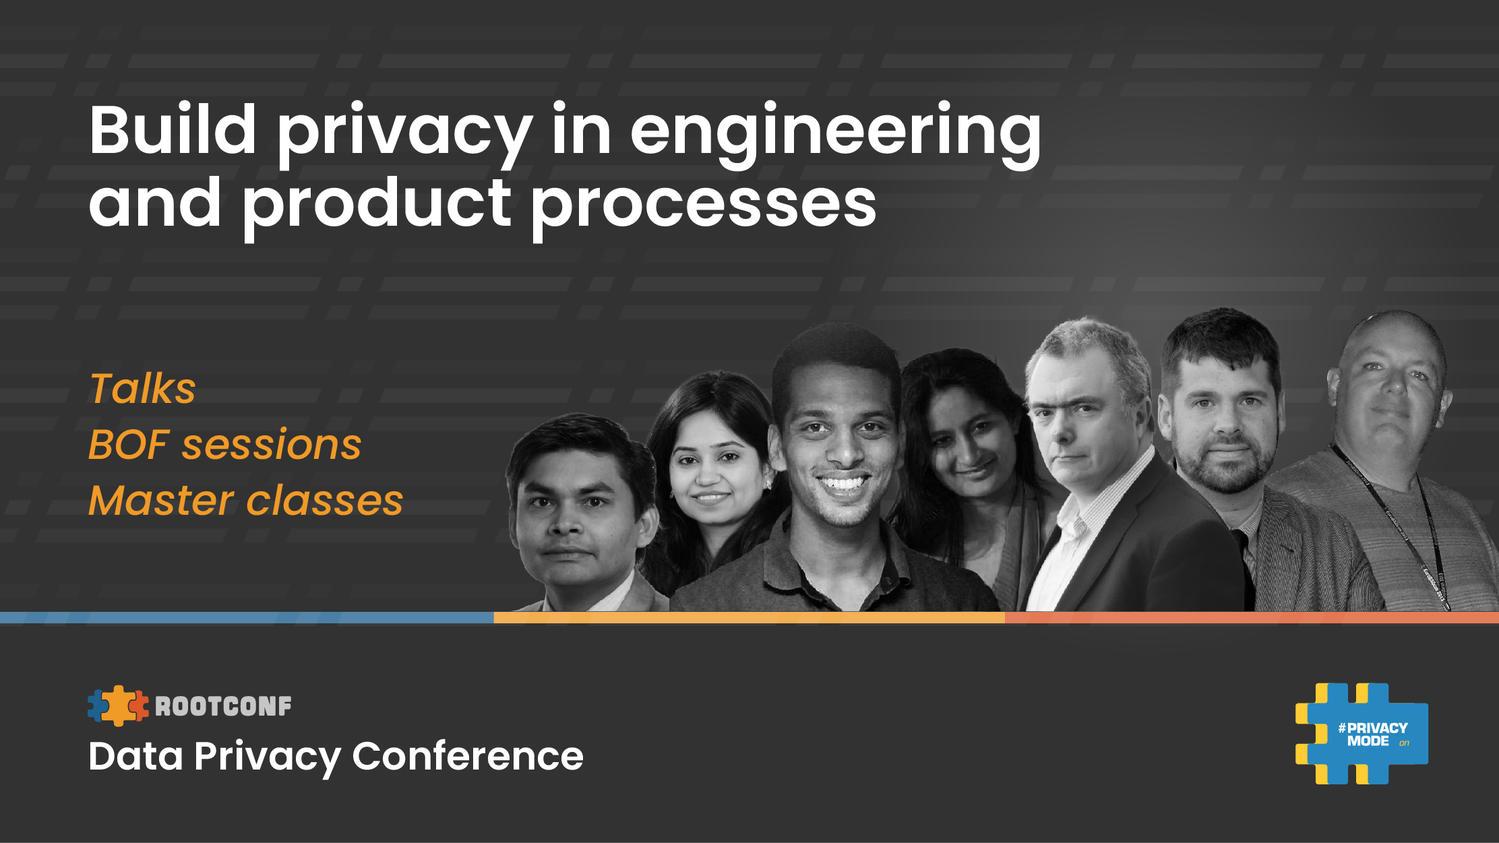 Data Privacy Conference